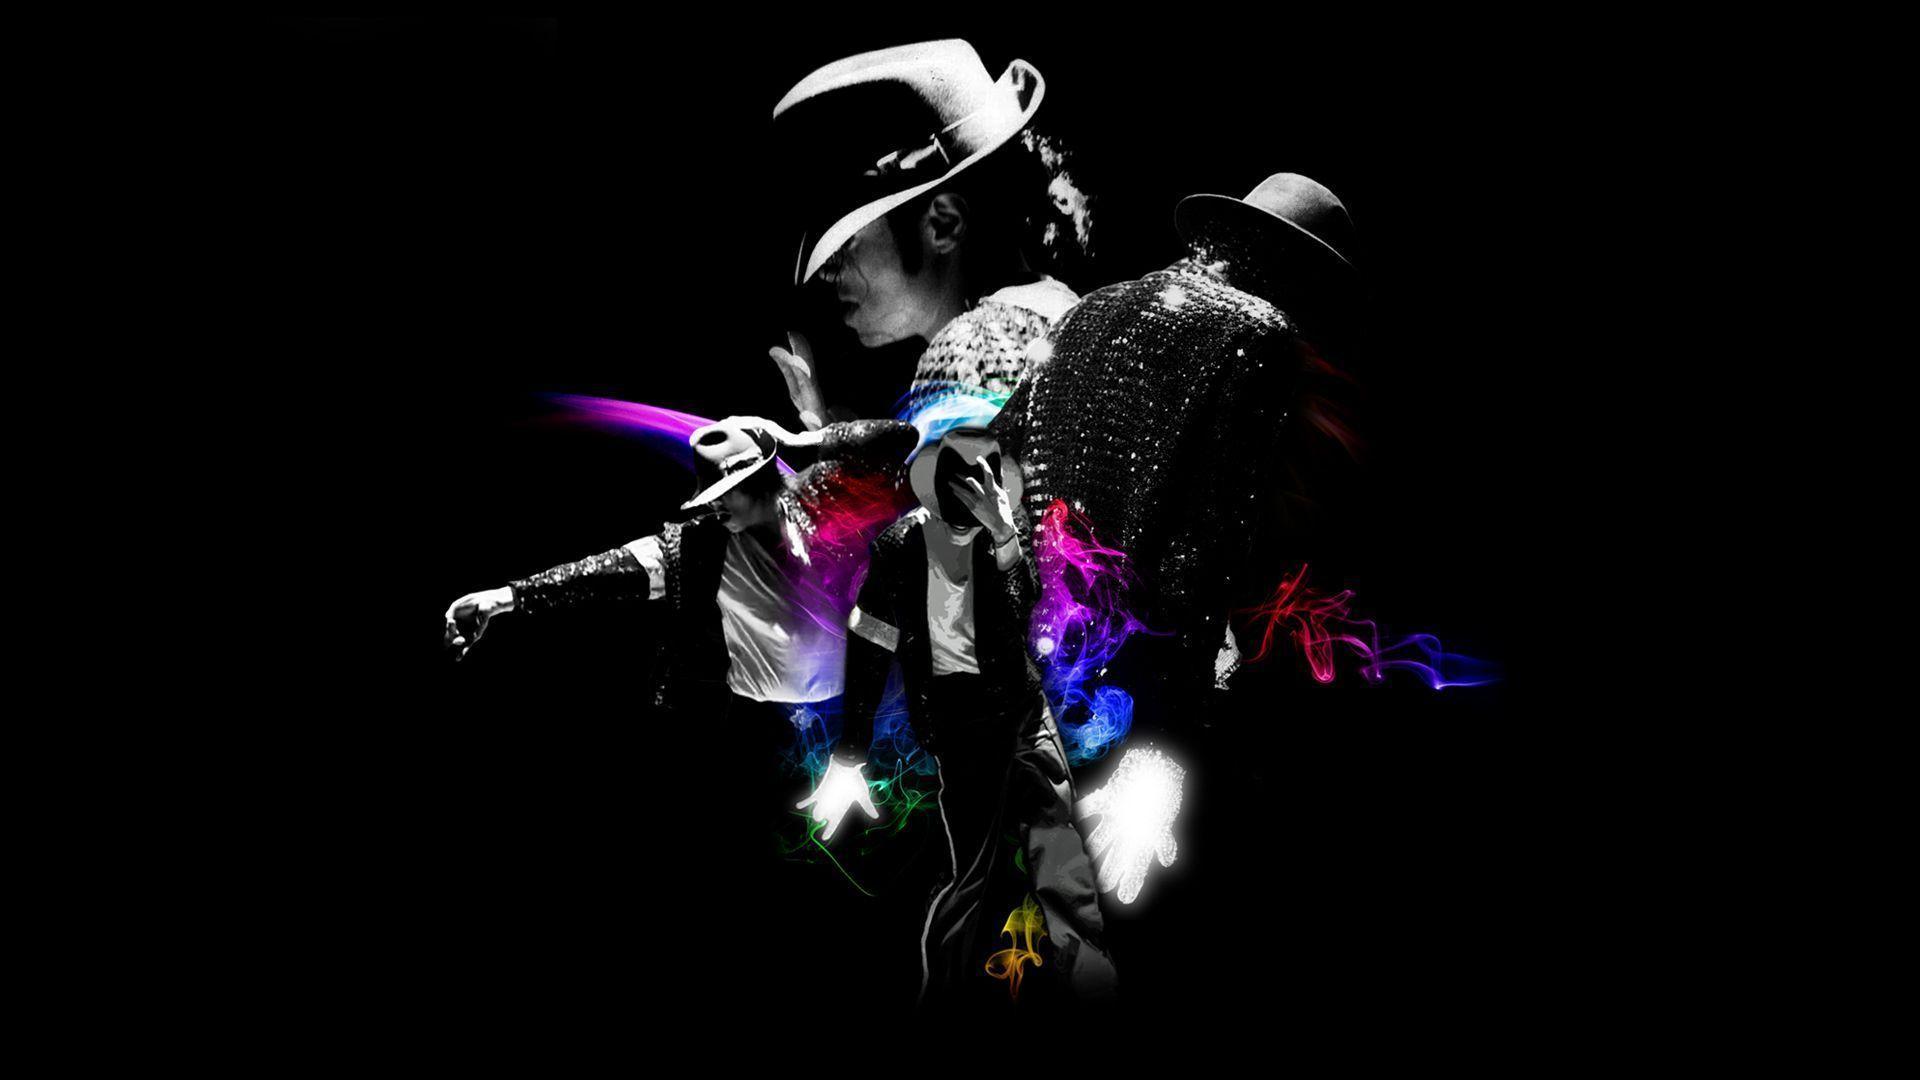 Michael Jackson Is King Of Pop Wallpaper Pics #2850 Wallpaper ...